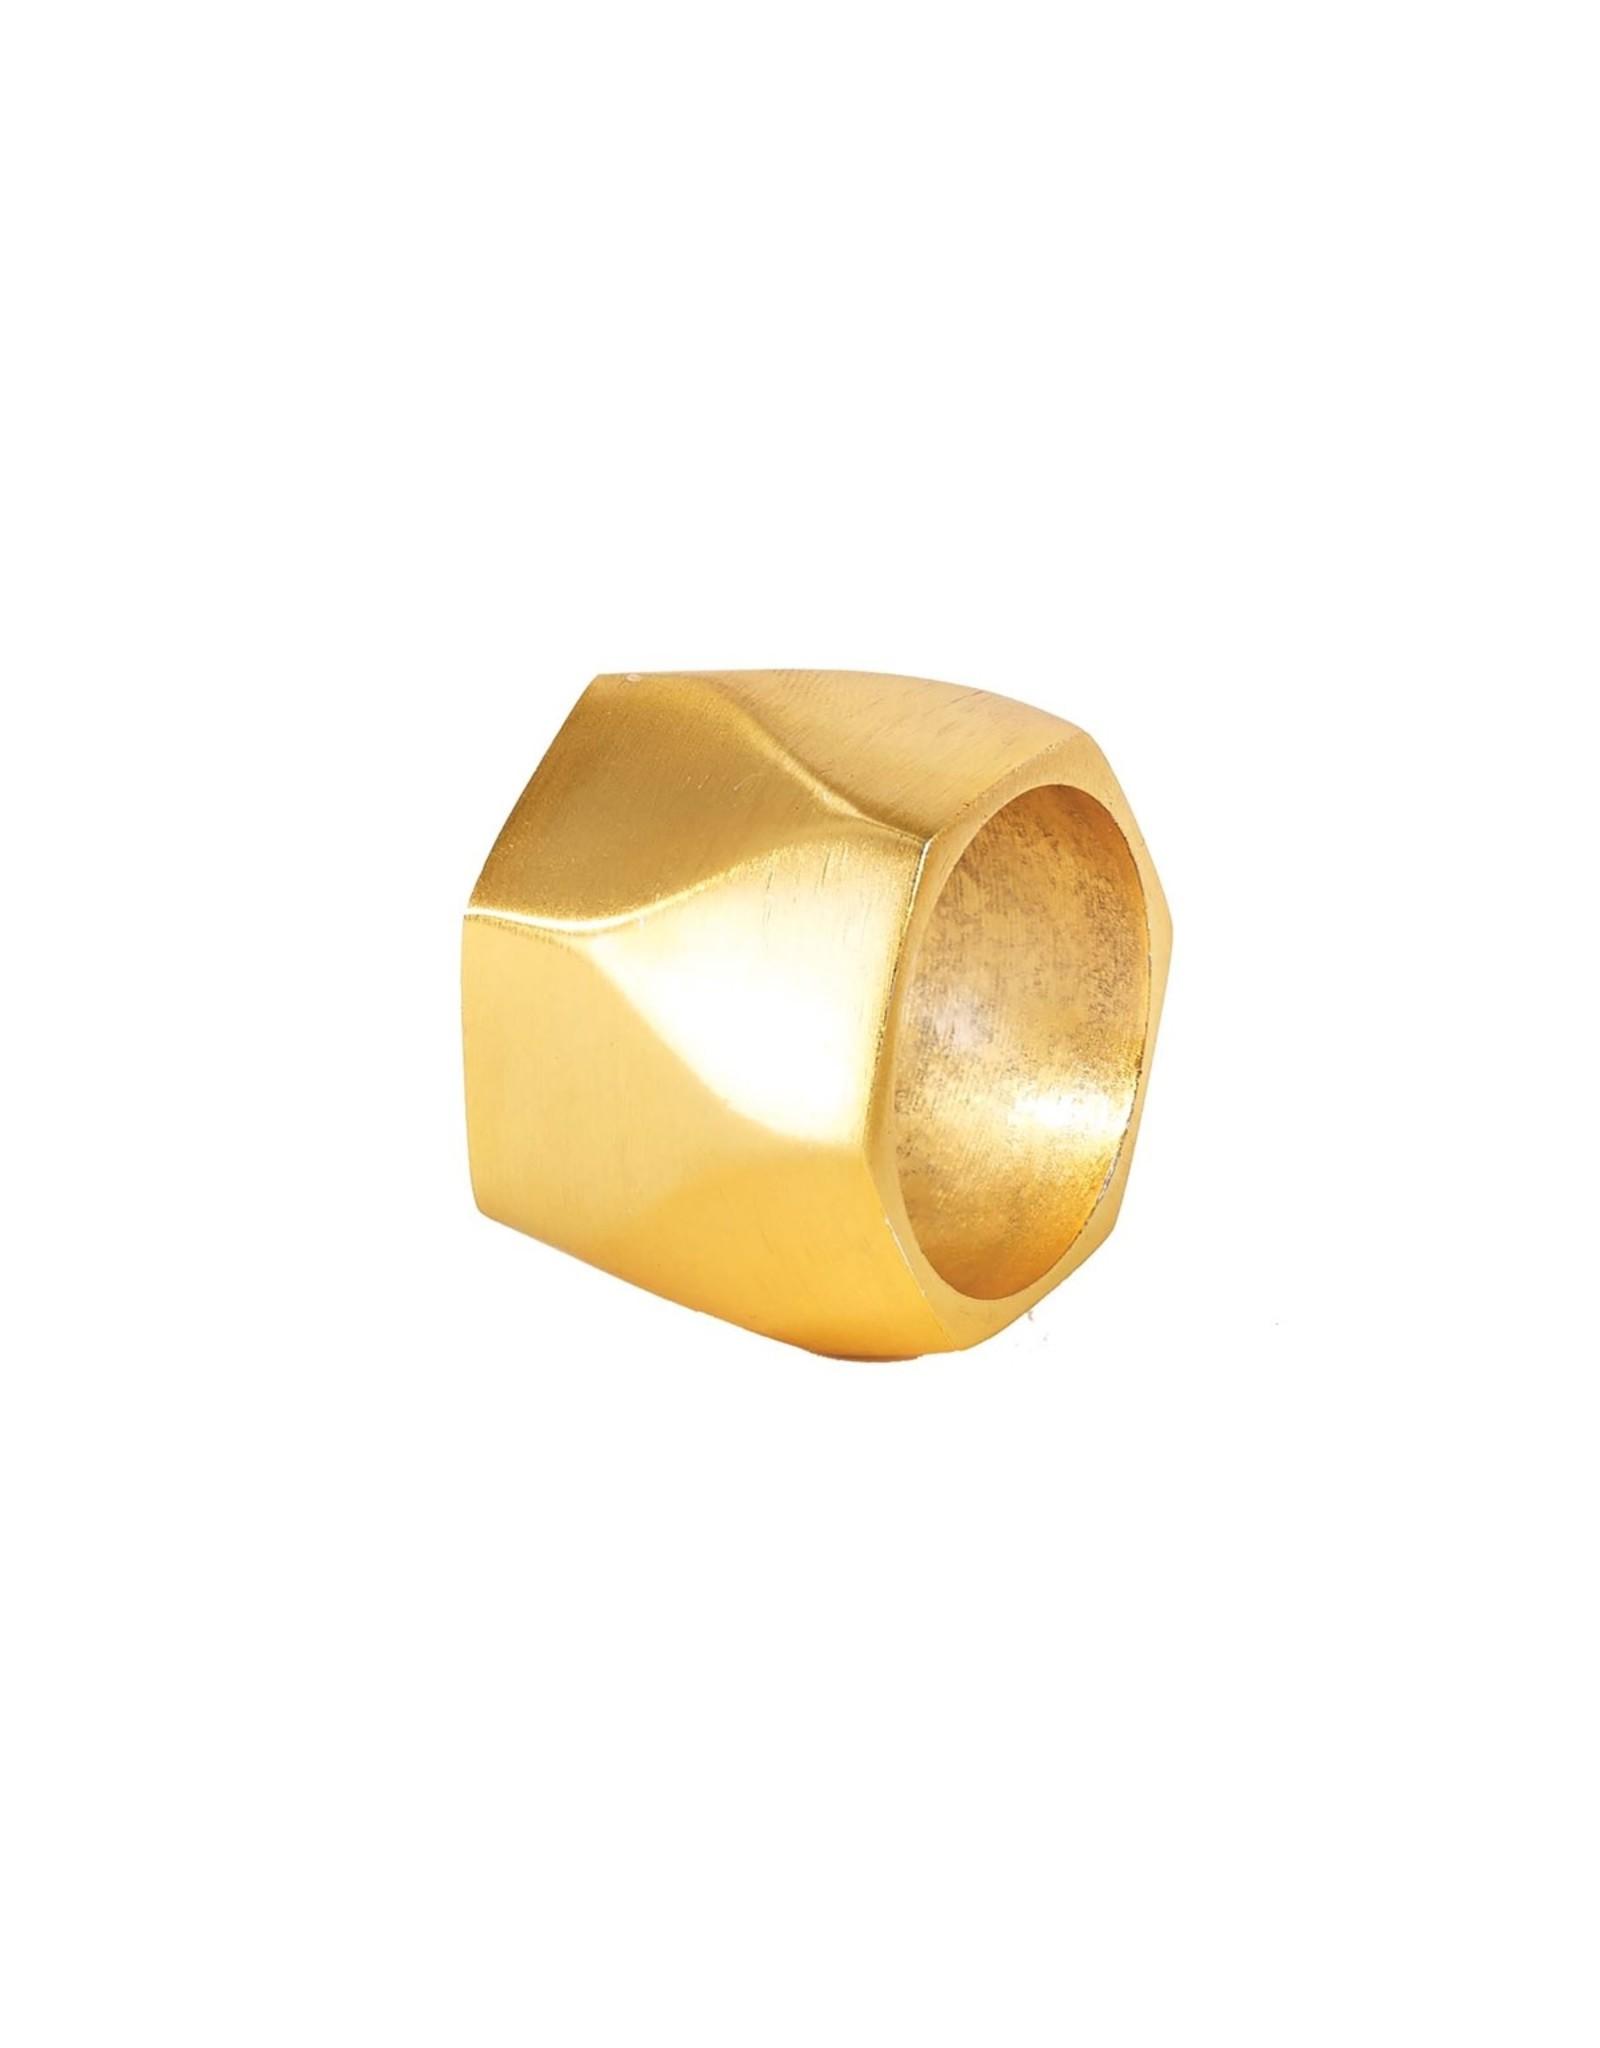 Bodrum Arch Gold Napkin Ring